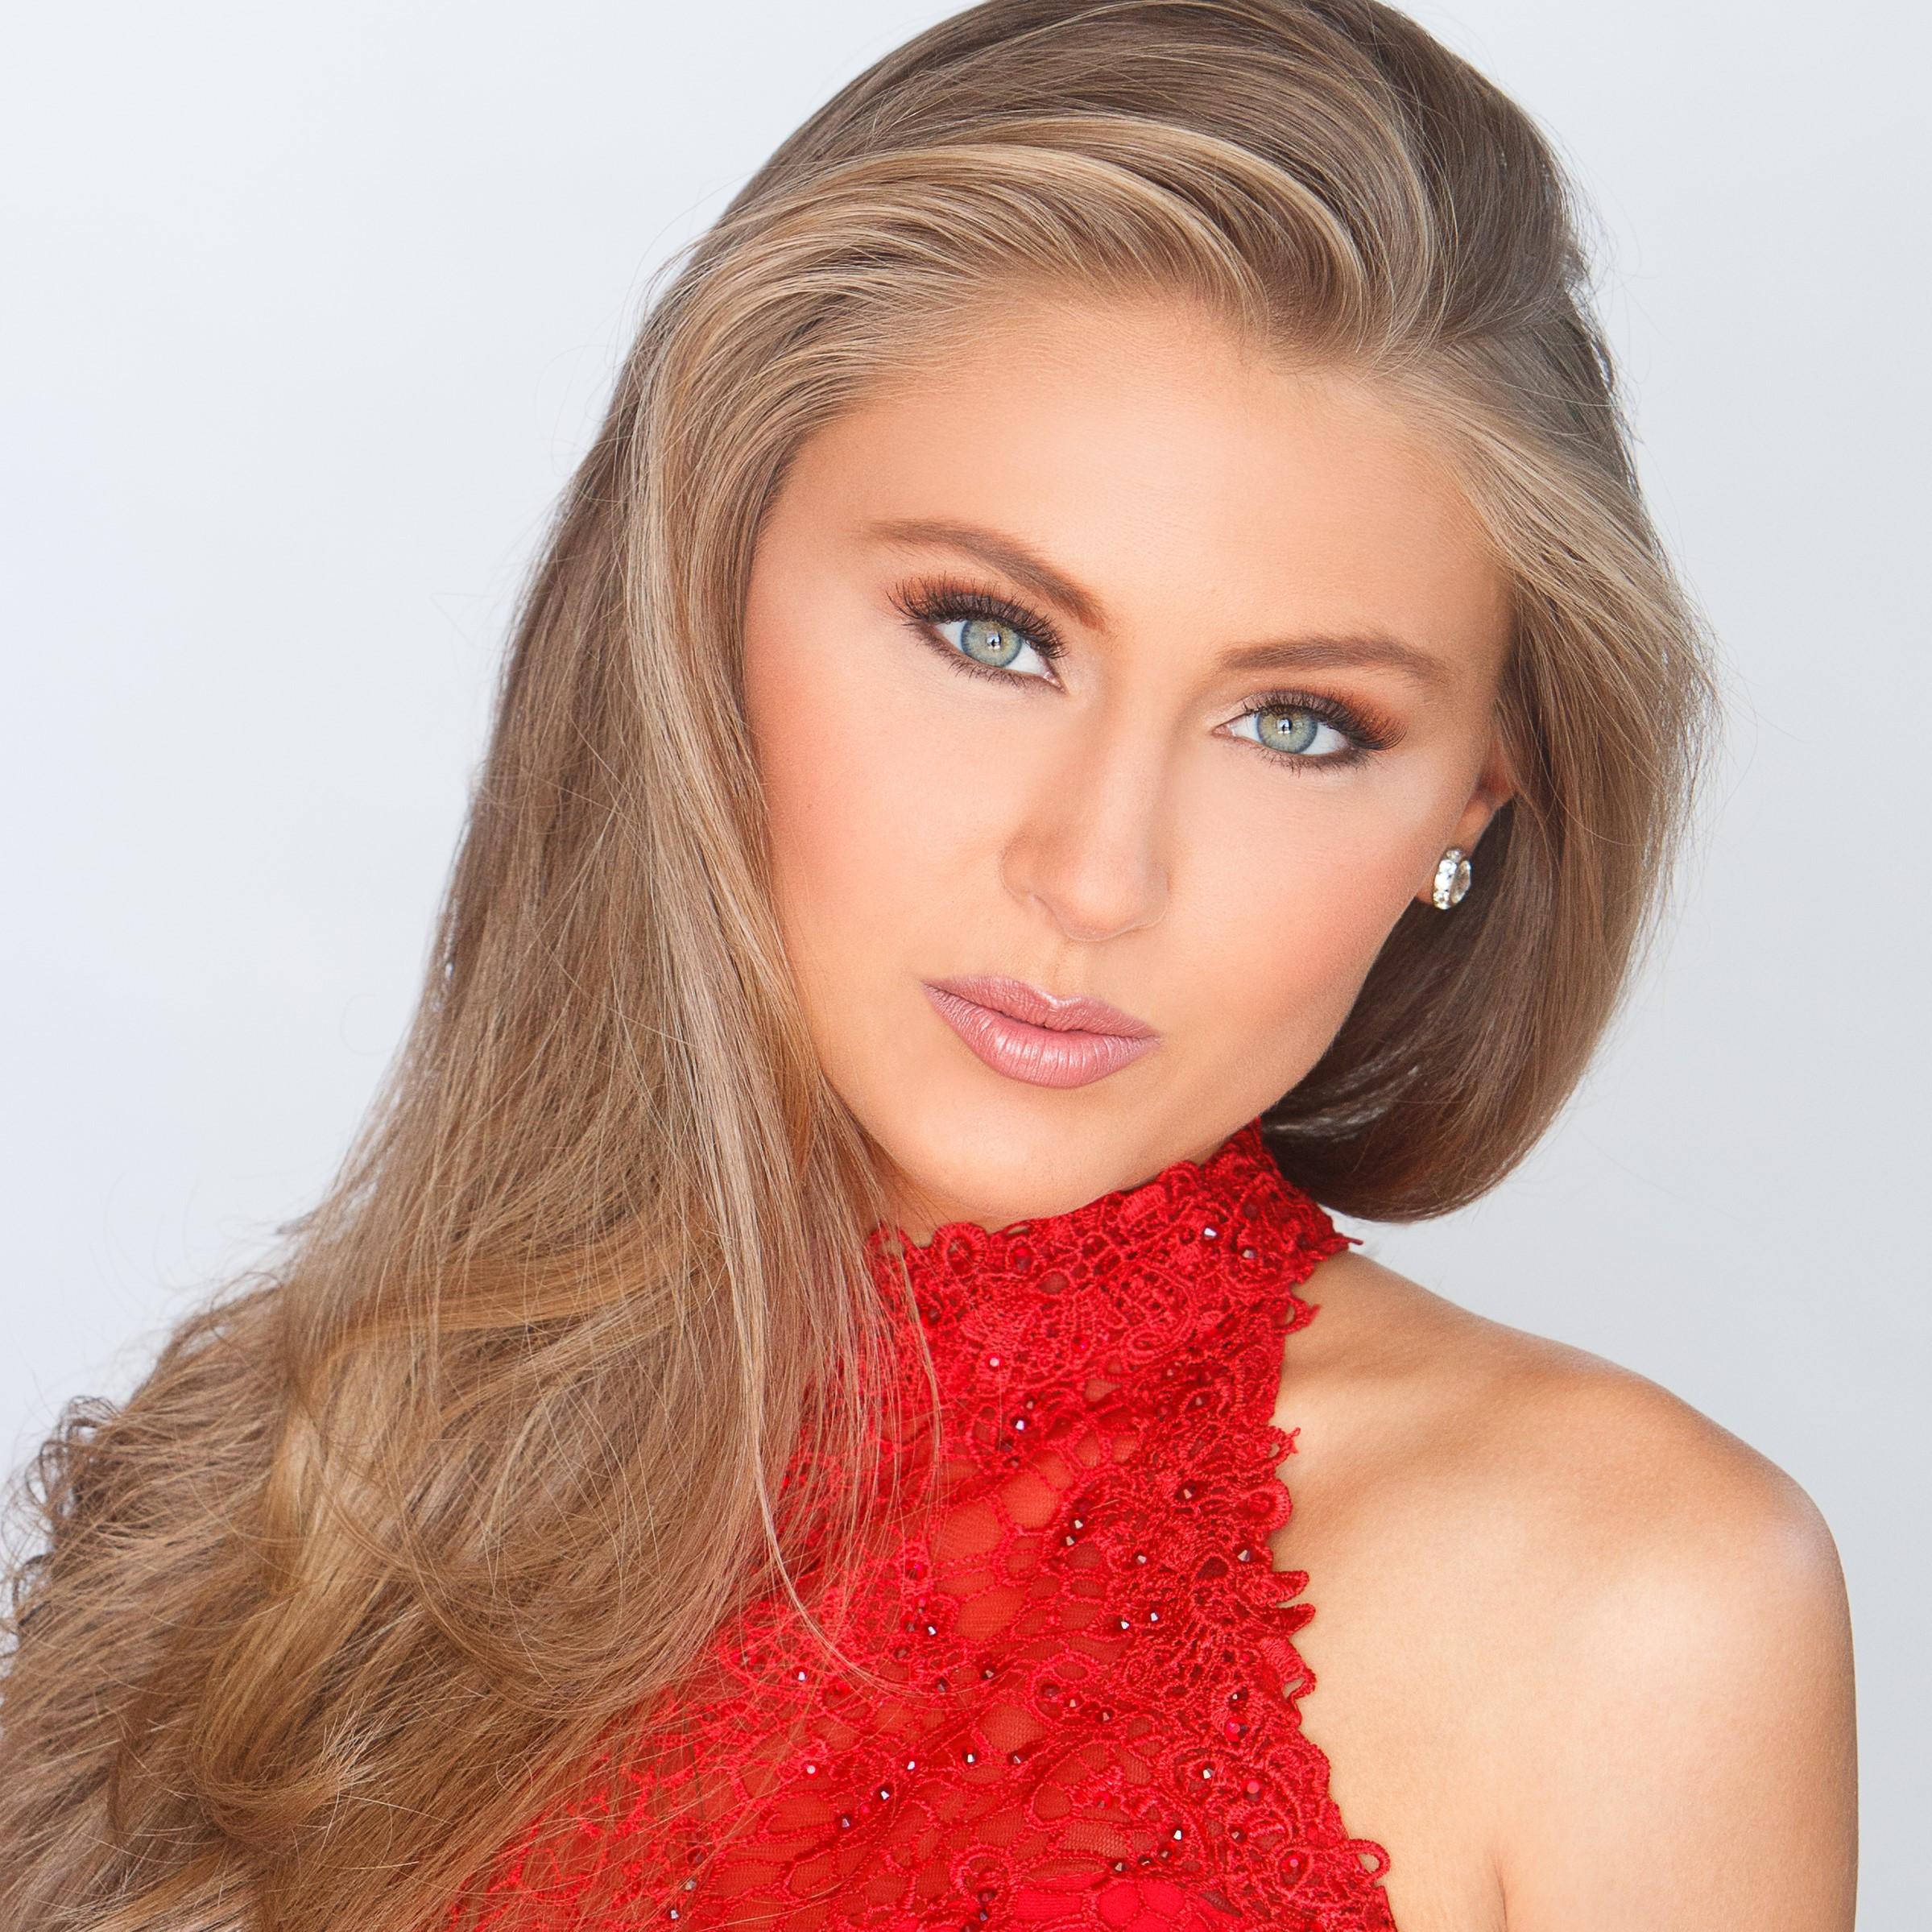 Alysa Bainbridge